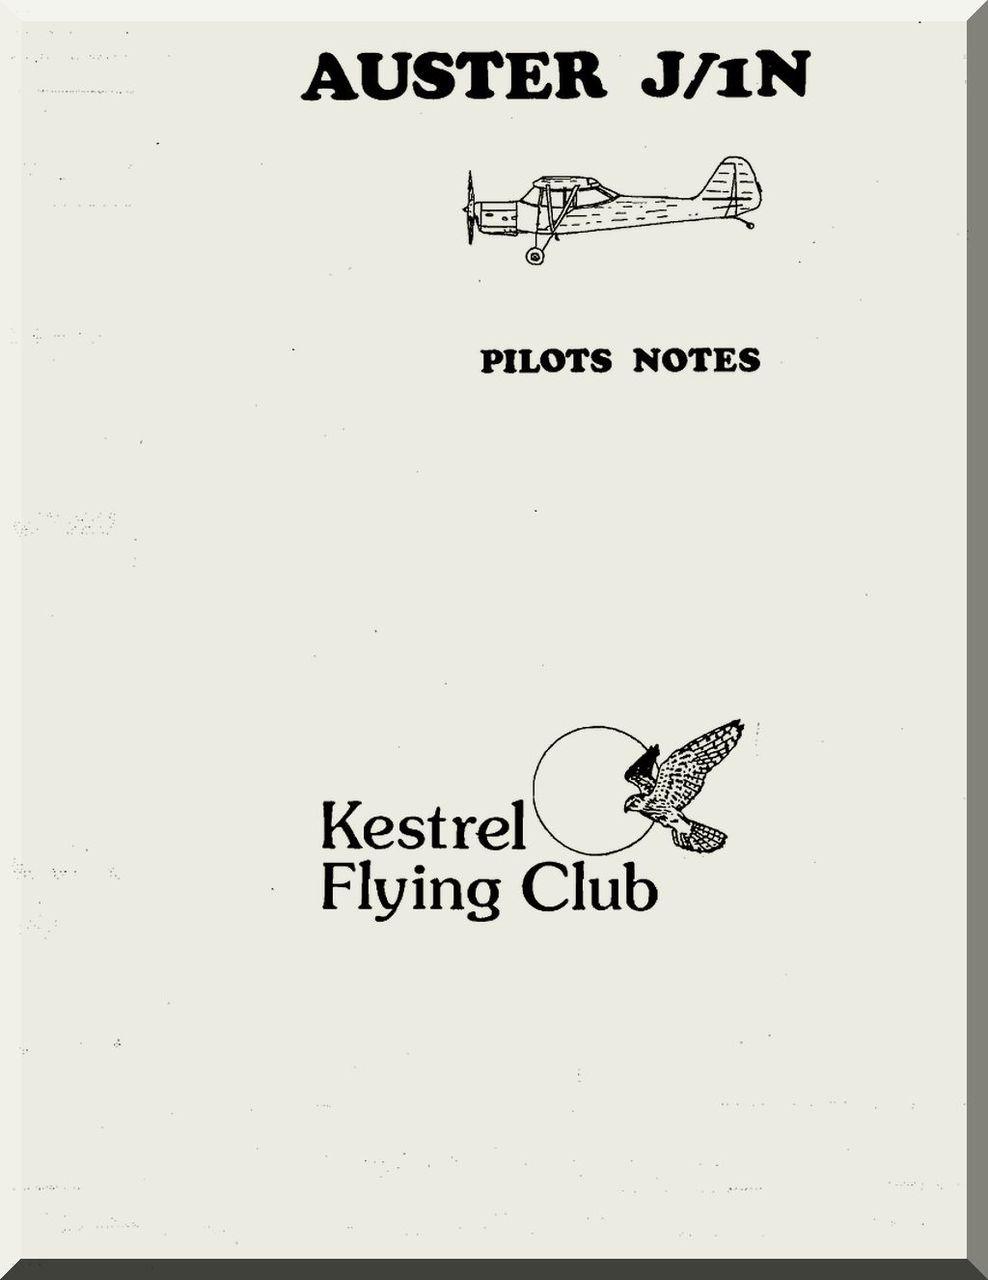 Auster J1N Aircraft Instructions Pilot's Notes Manual